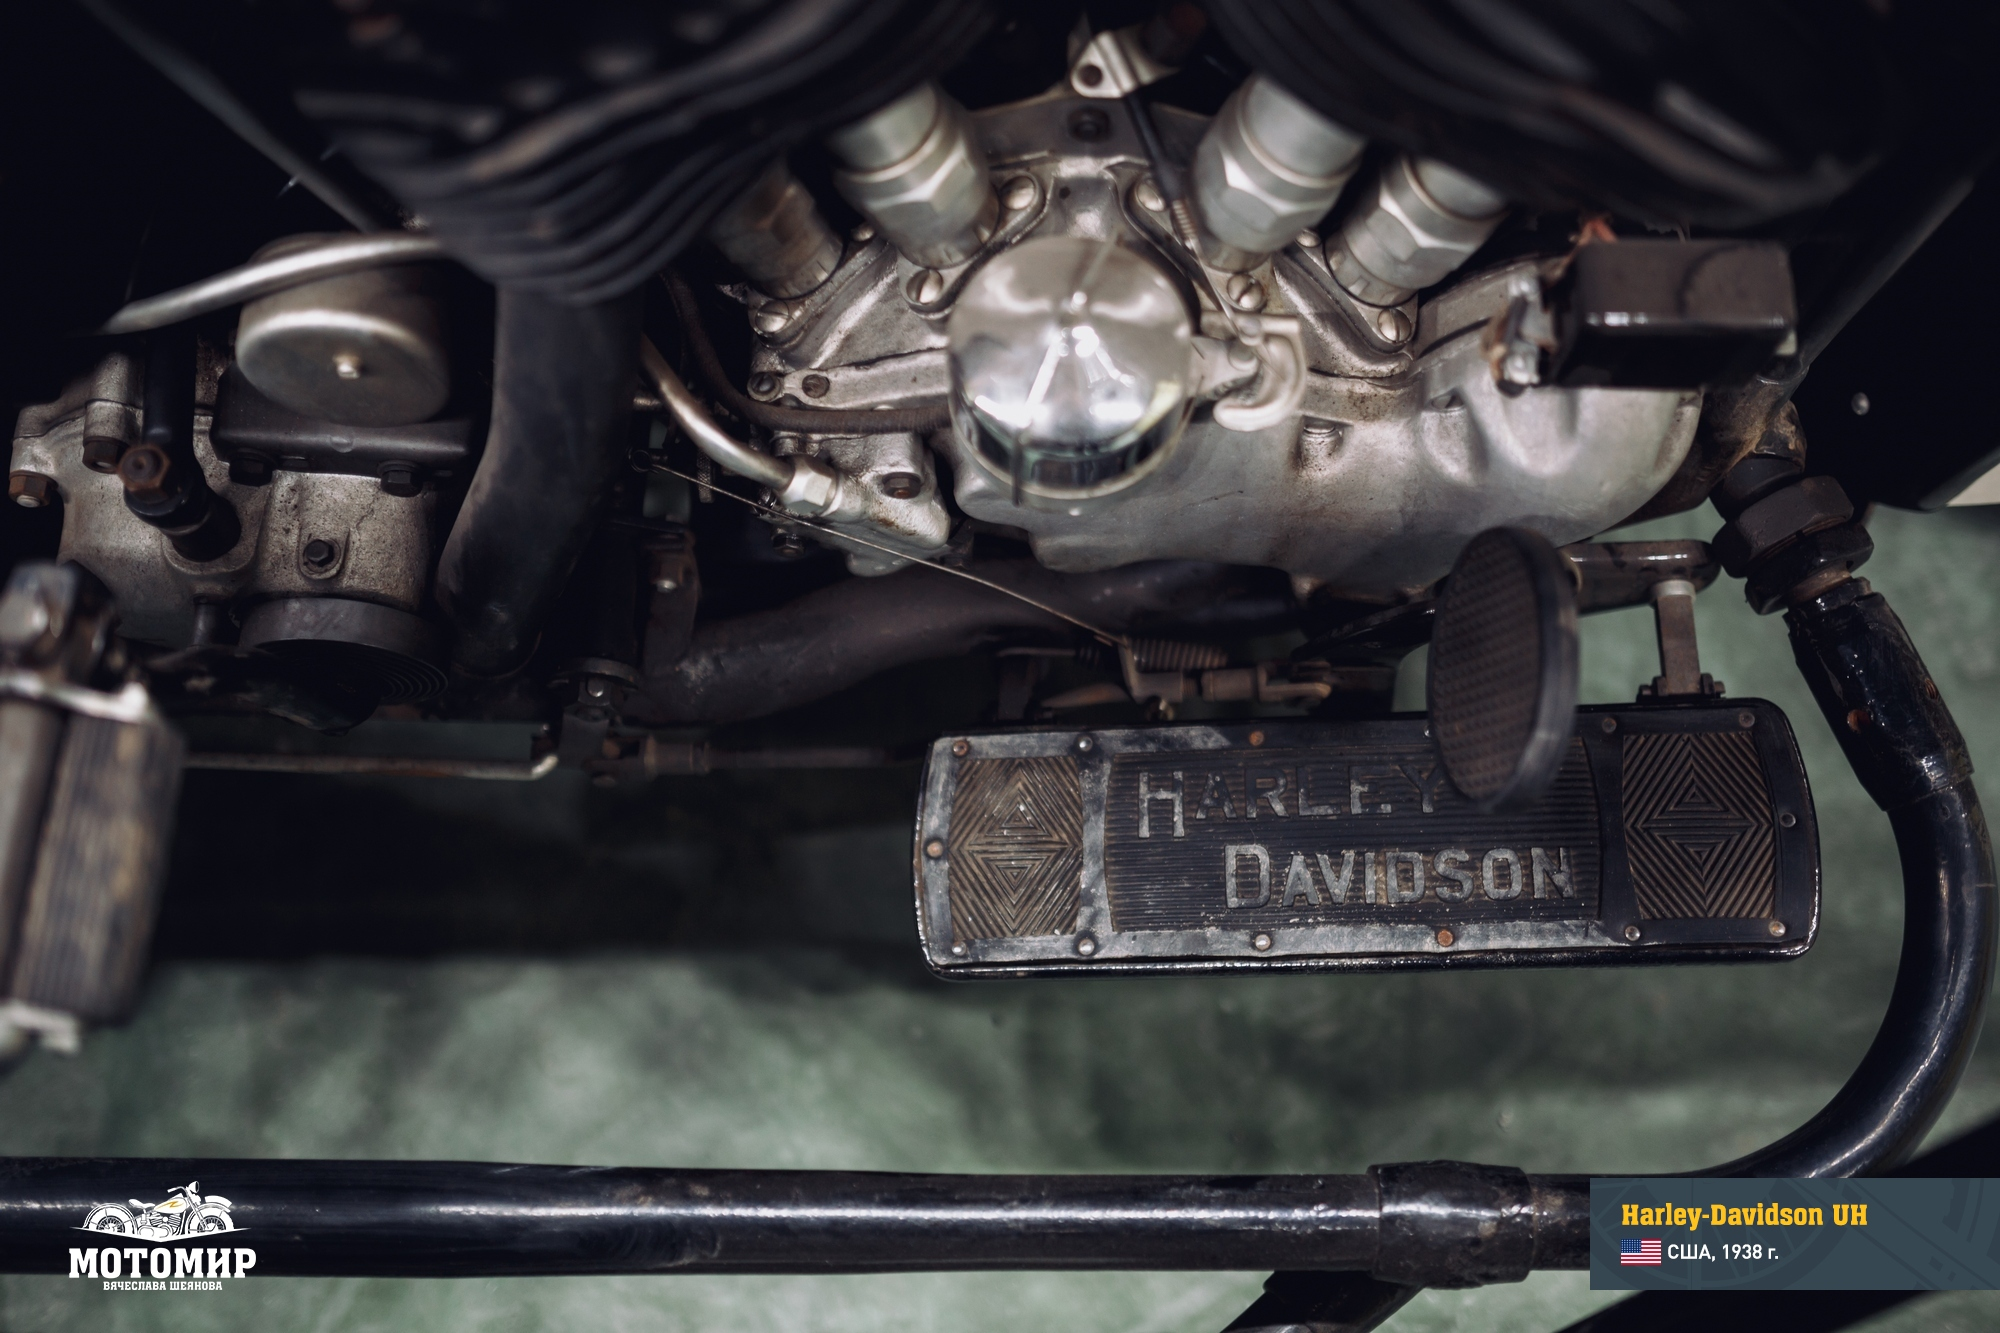 harley-davidson-uh-201502-web-15